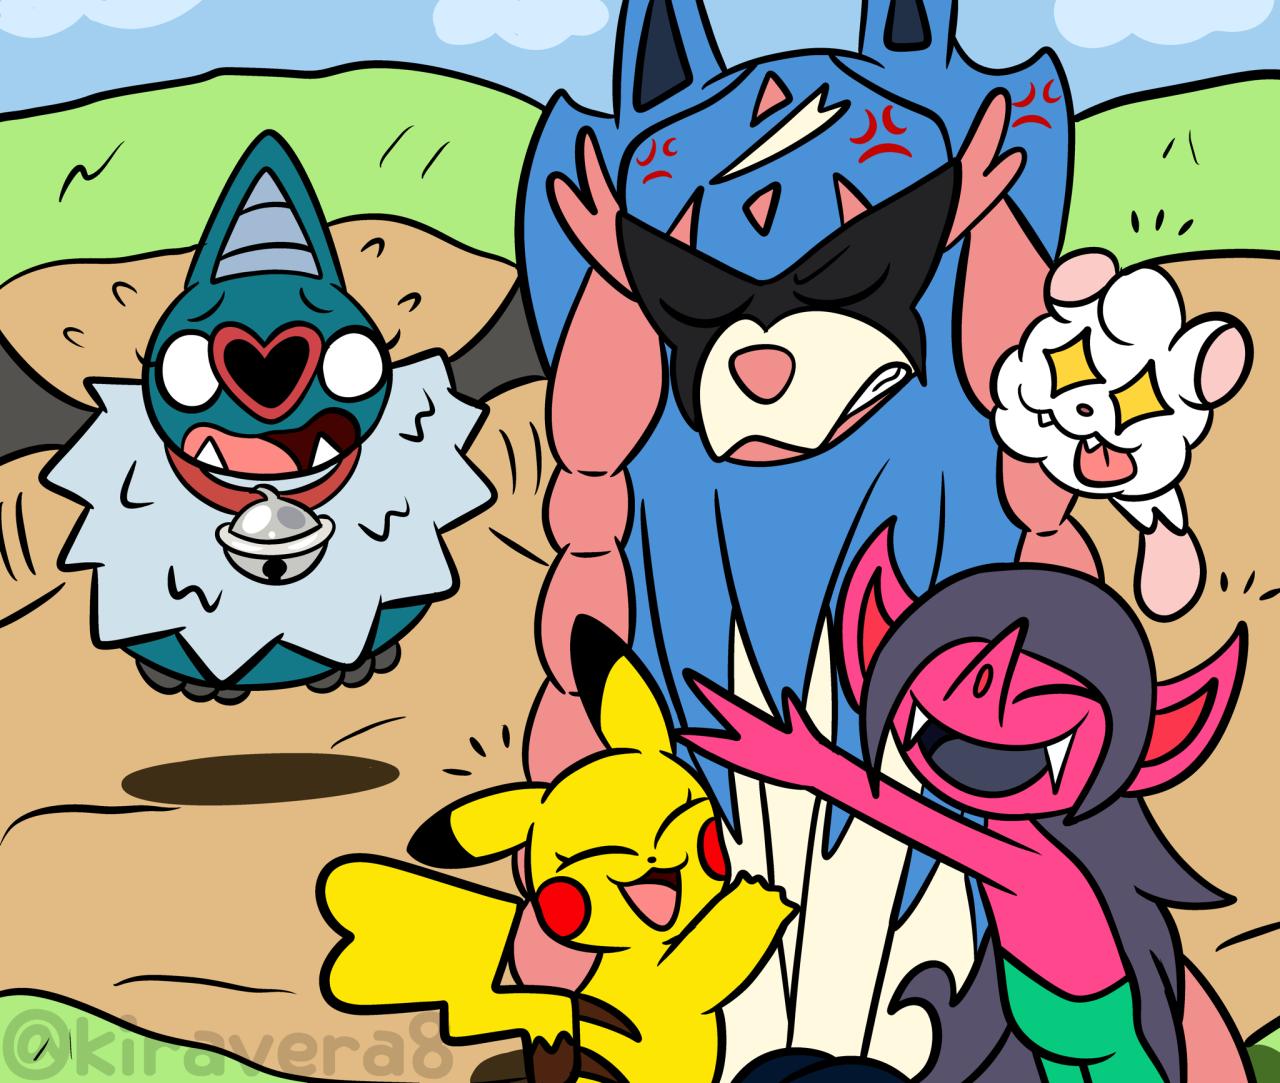 Kira Kira In 2020 Cute Pokemon Tag Art Pokemon